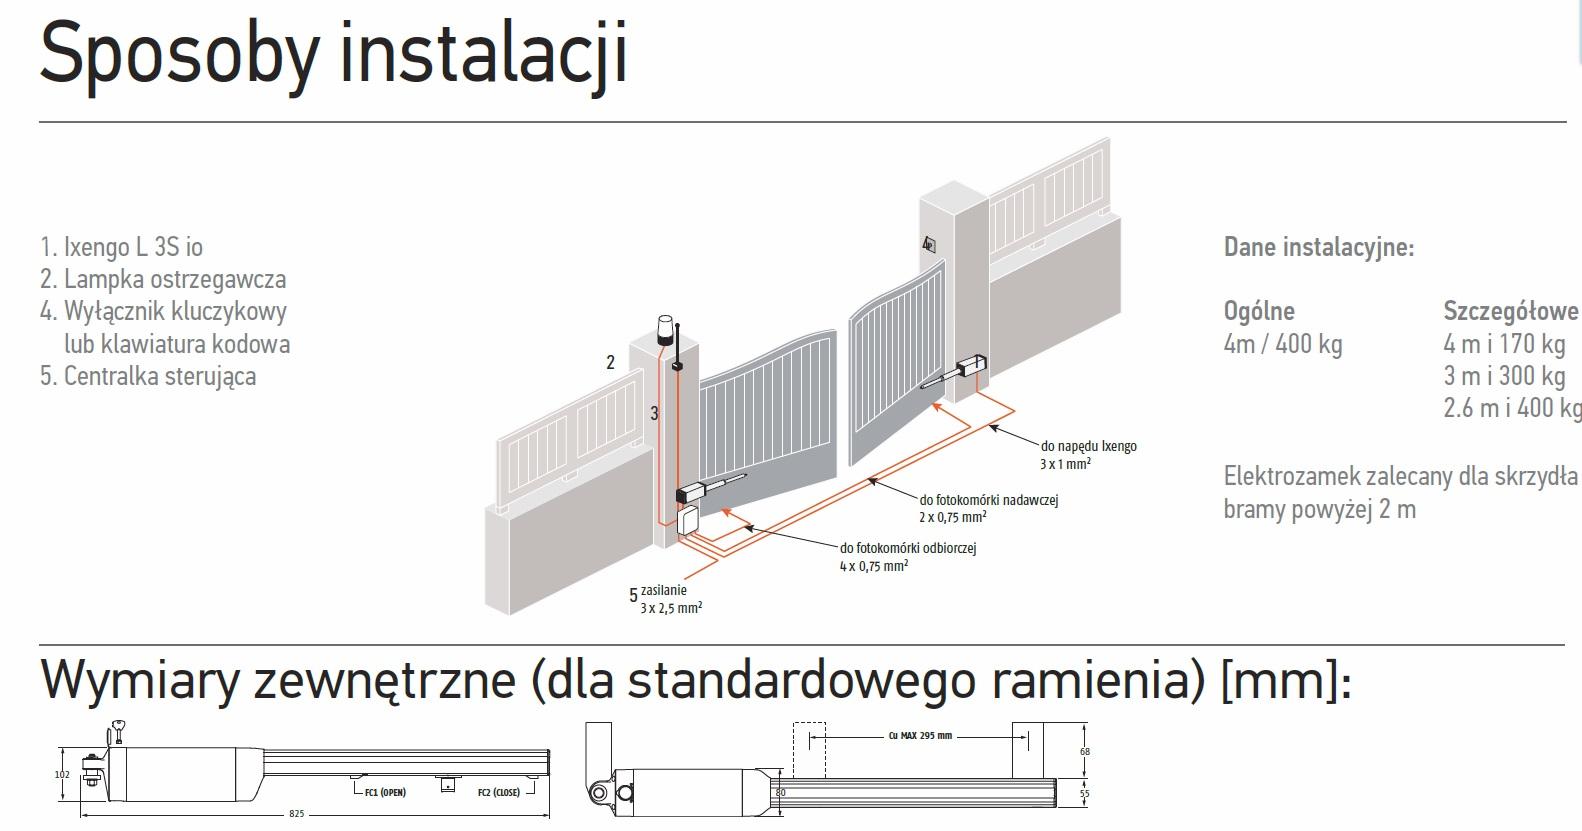 Ixengo instalacja